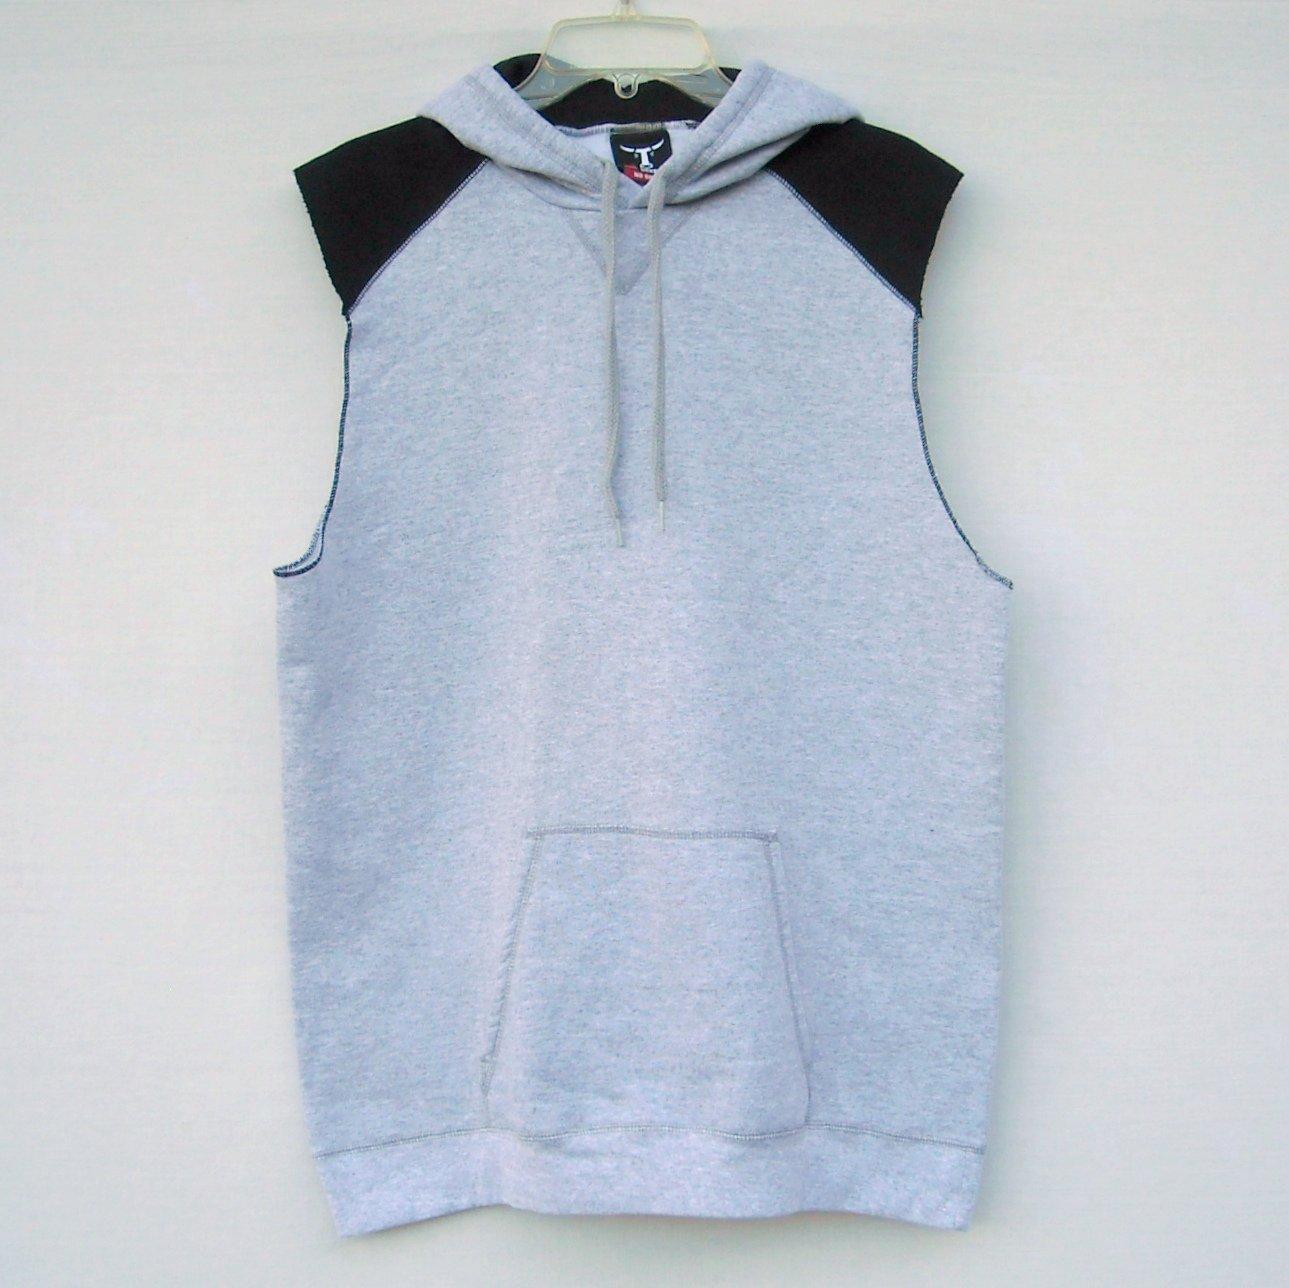 25f54cf6 Jogger Sleeveless Gray Hoodie Muscle Shirt Hanes Size S